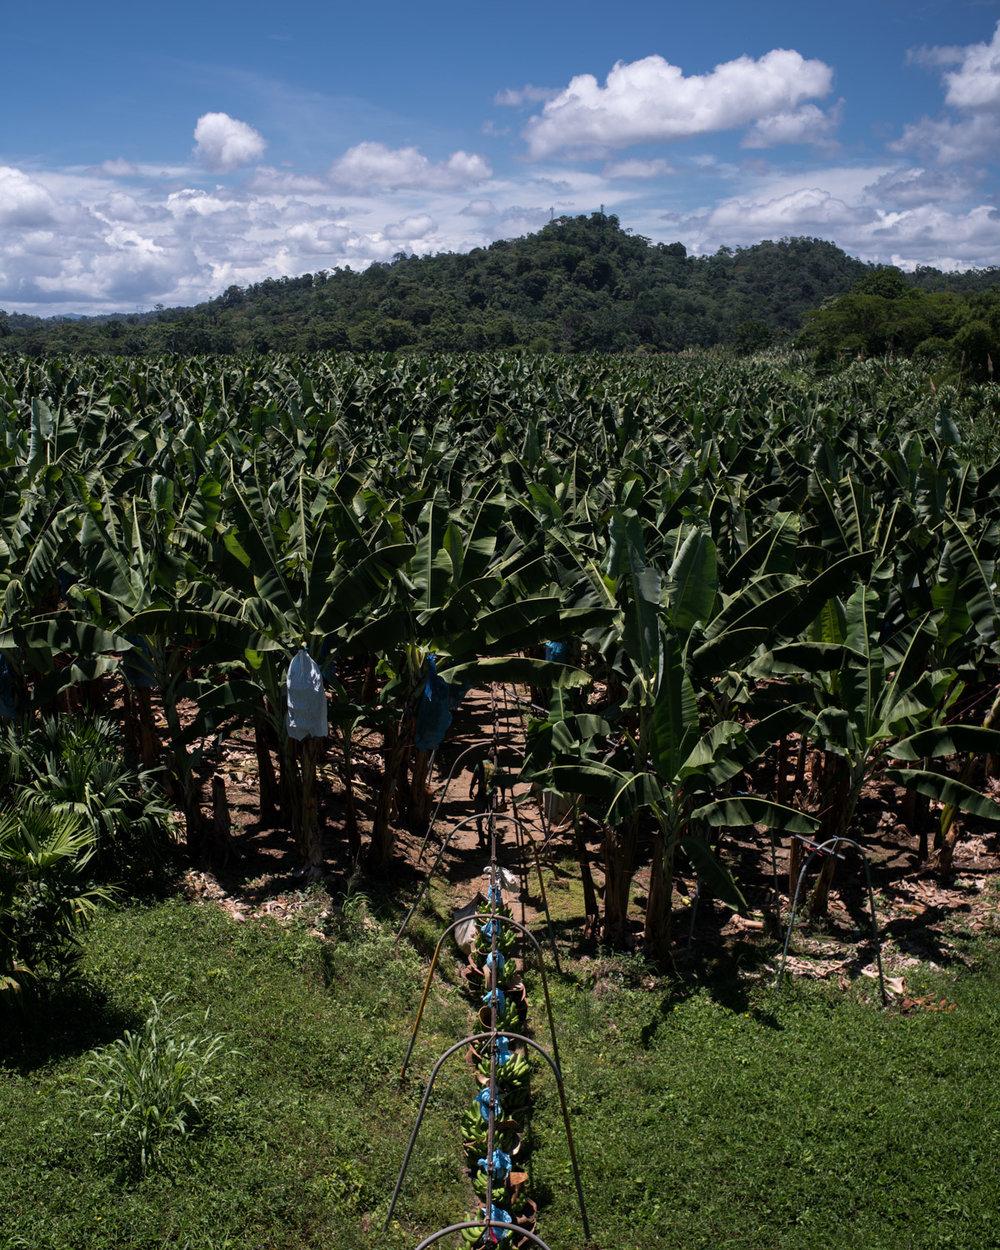 costa-rica-banana-trade-9563.jpg